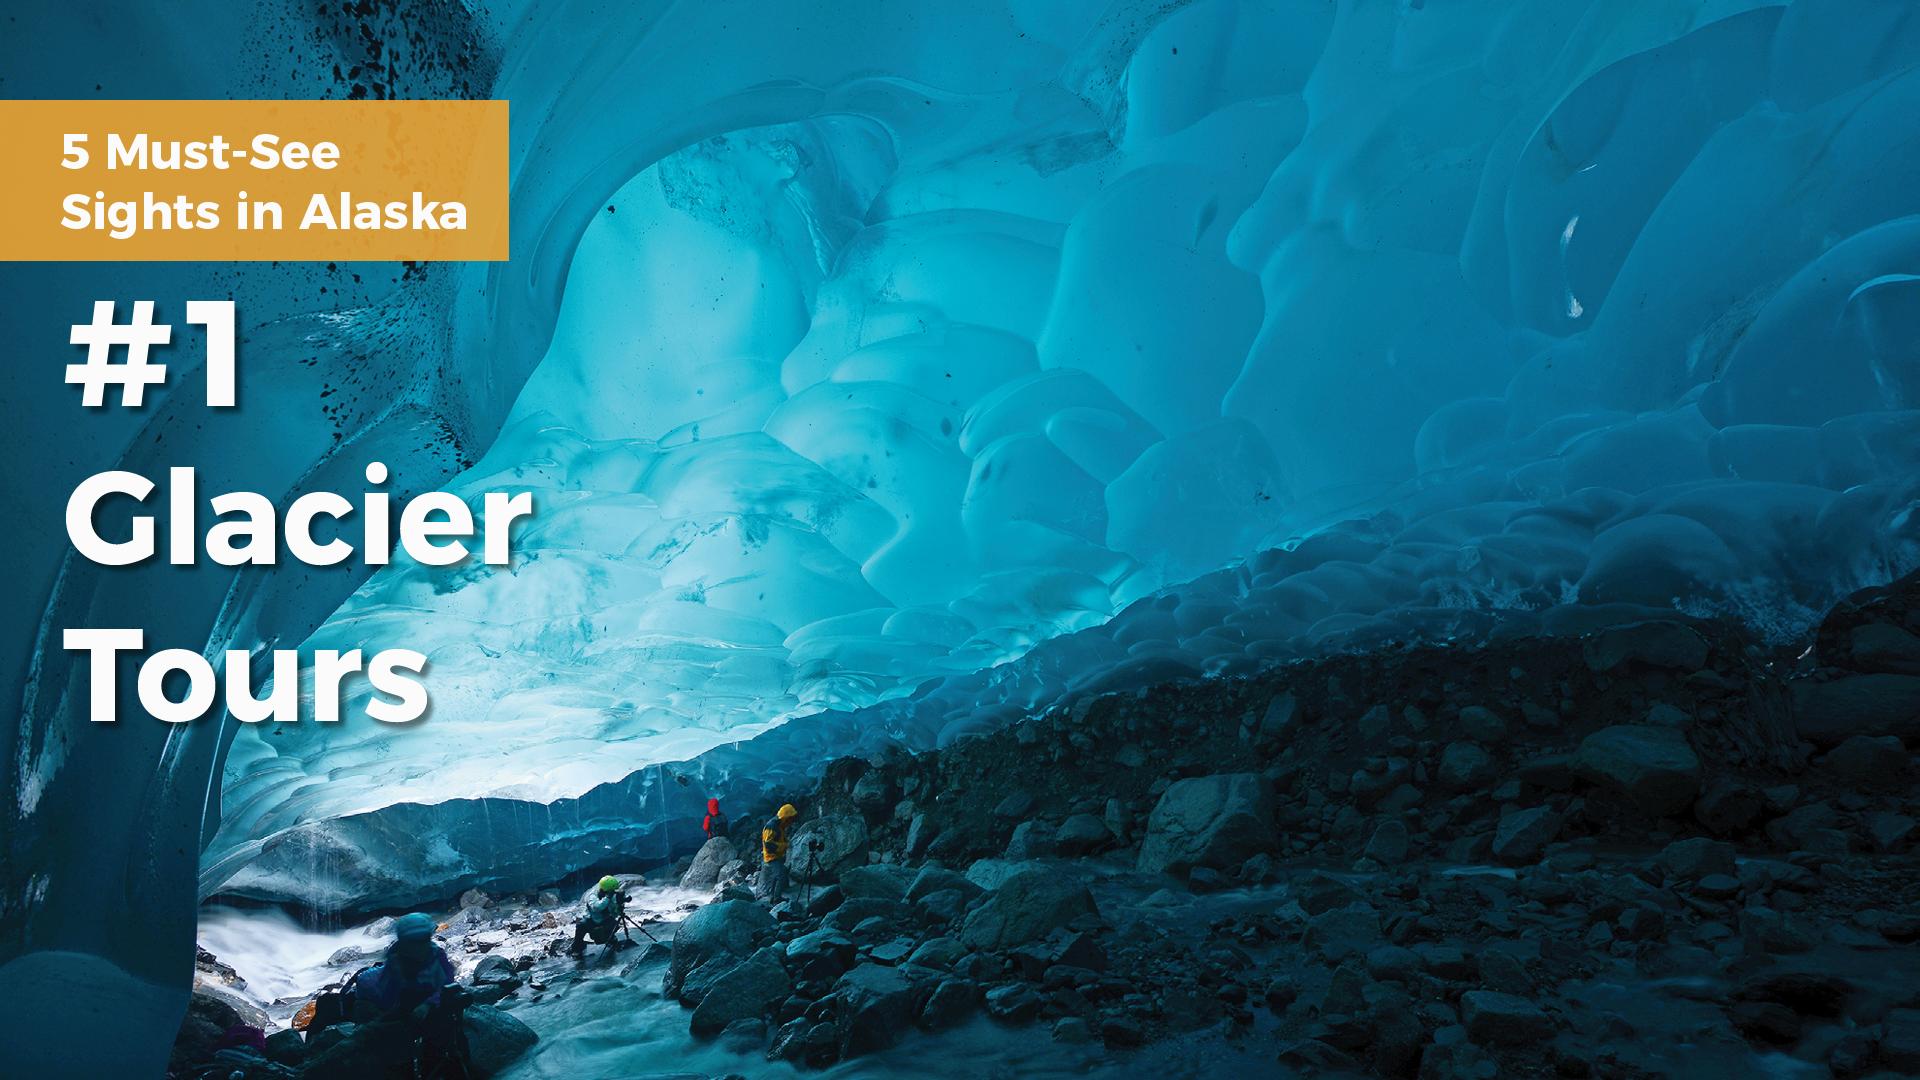 5-must-see-sights-in-alaska-glacier-tours